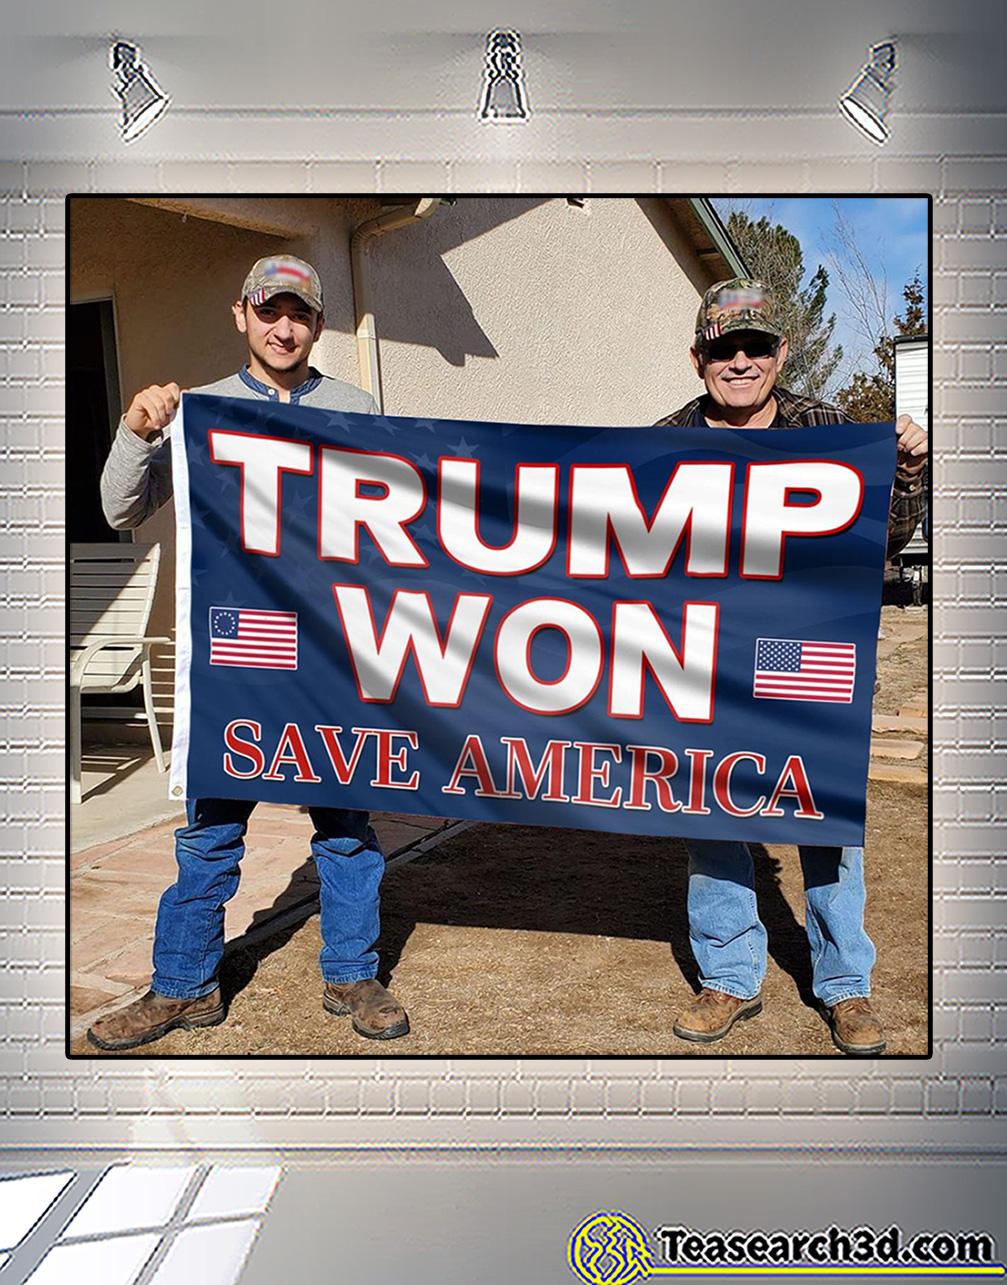 Trump won save america flag 2